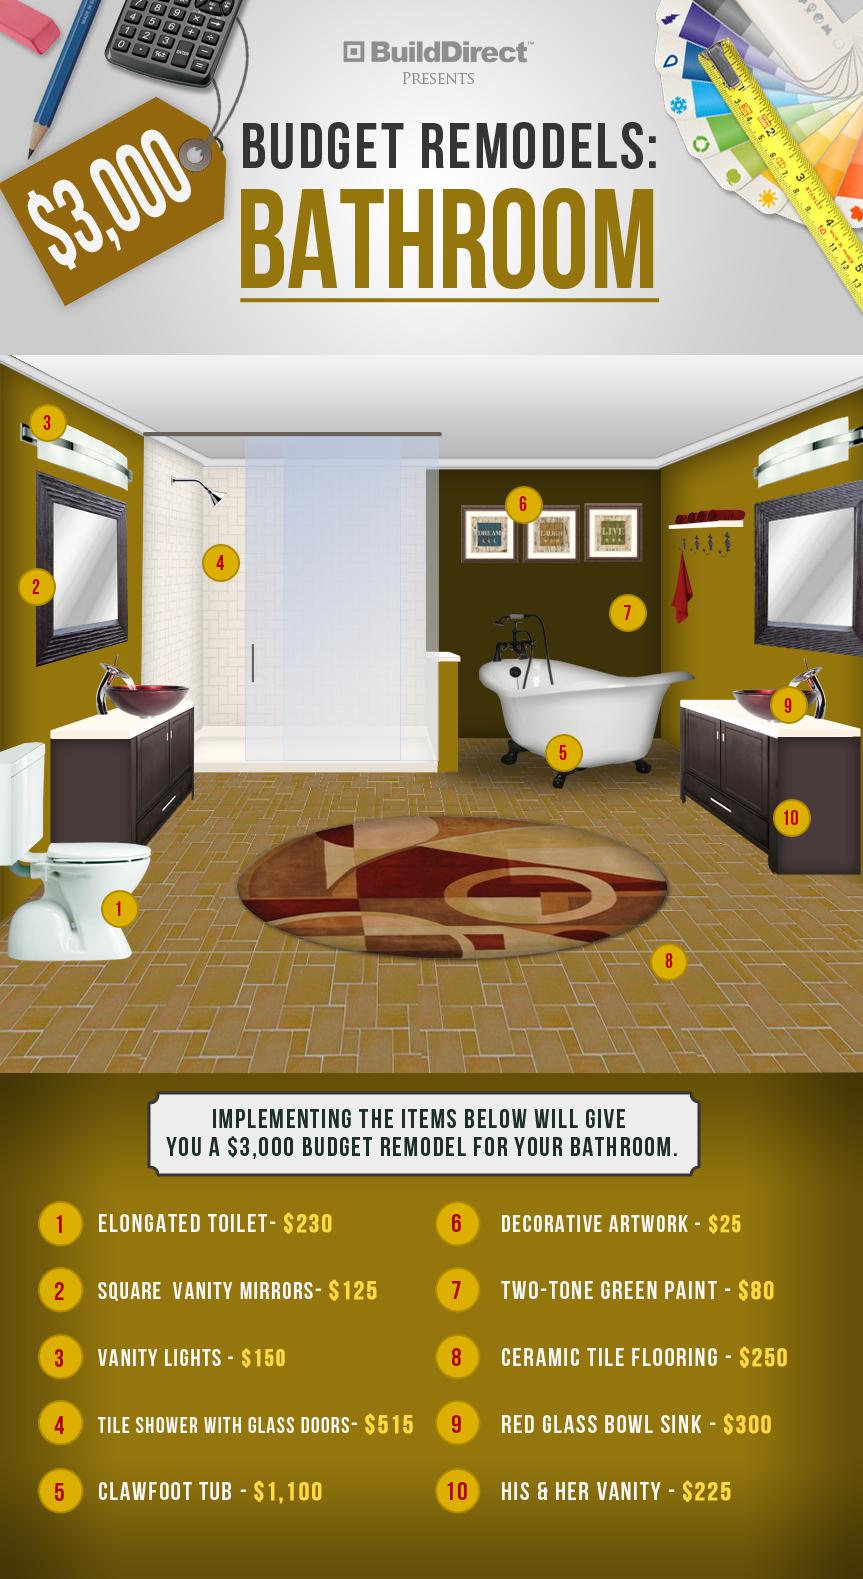 Bathroom Remodel 3000